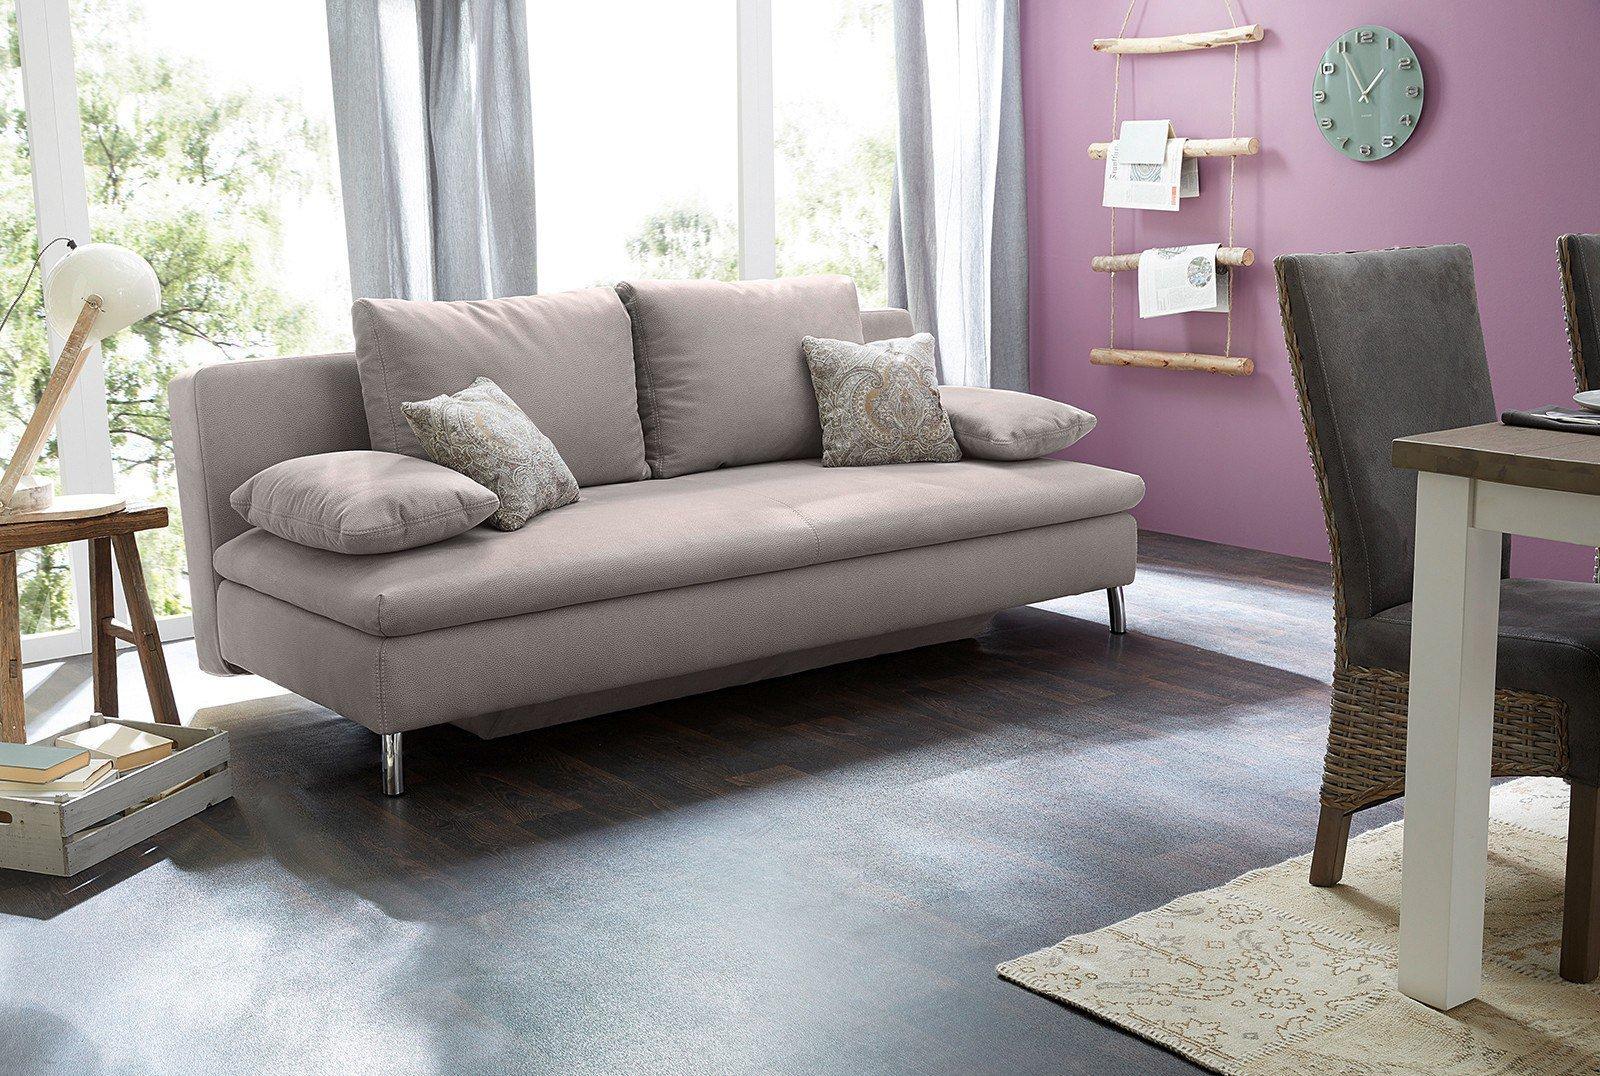 jockenh fer jason jan funktionssofa grau mit bettkasten. Black Bedroom Furniture Sets. Home Design Ideas